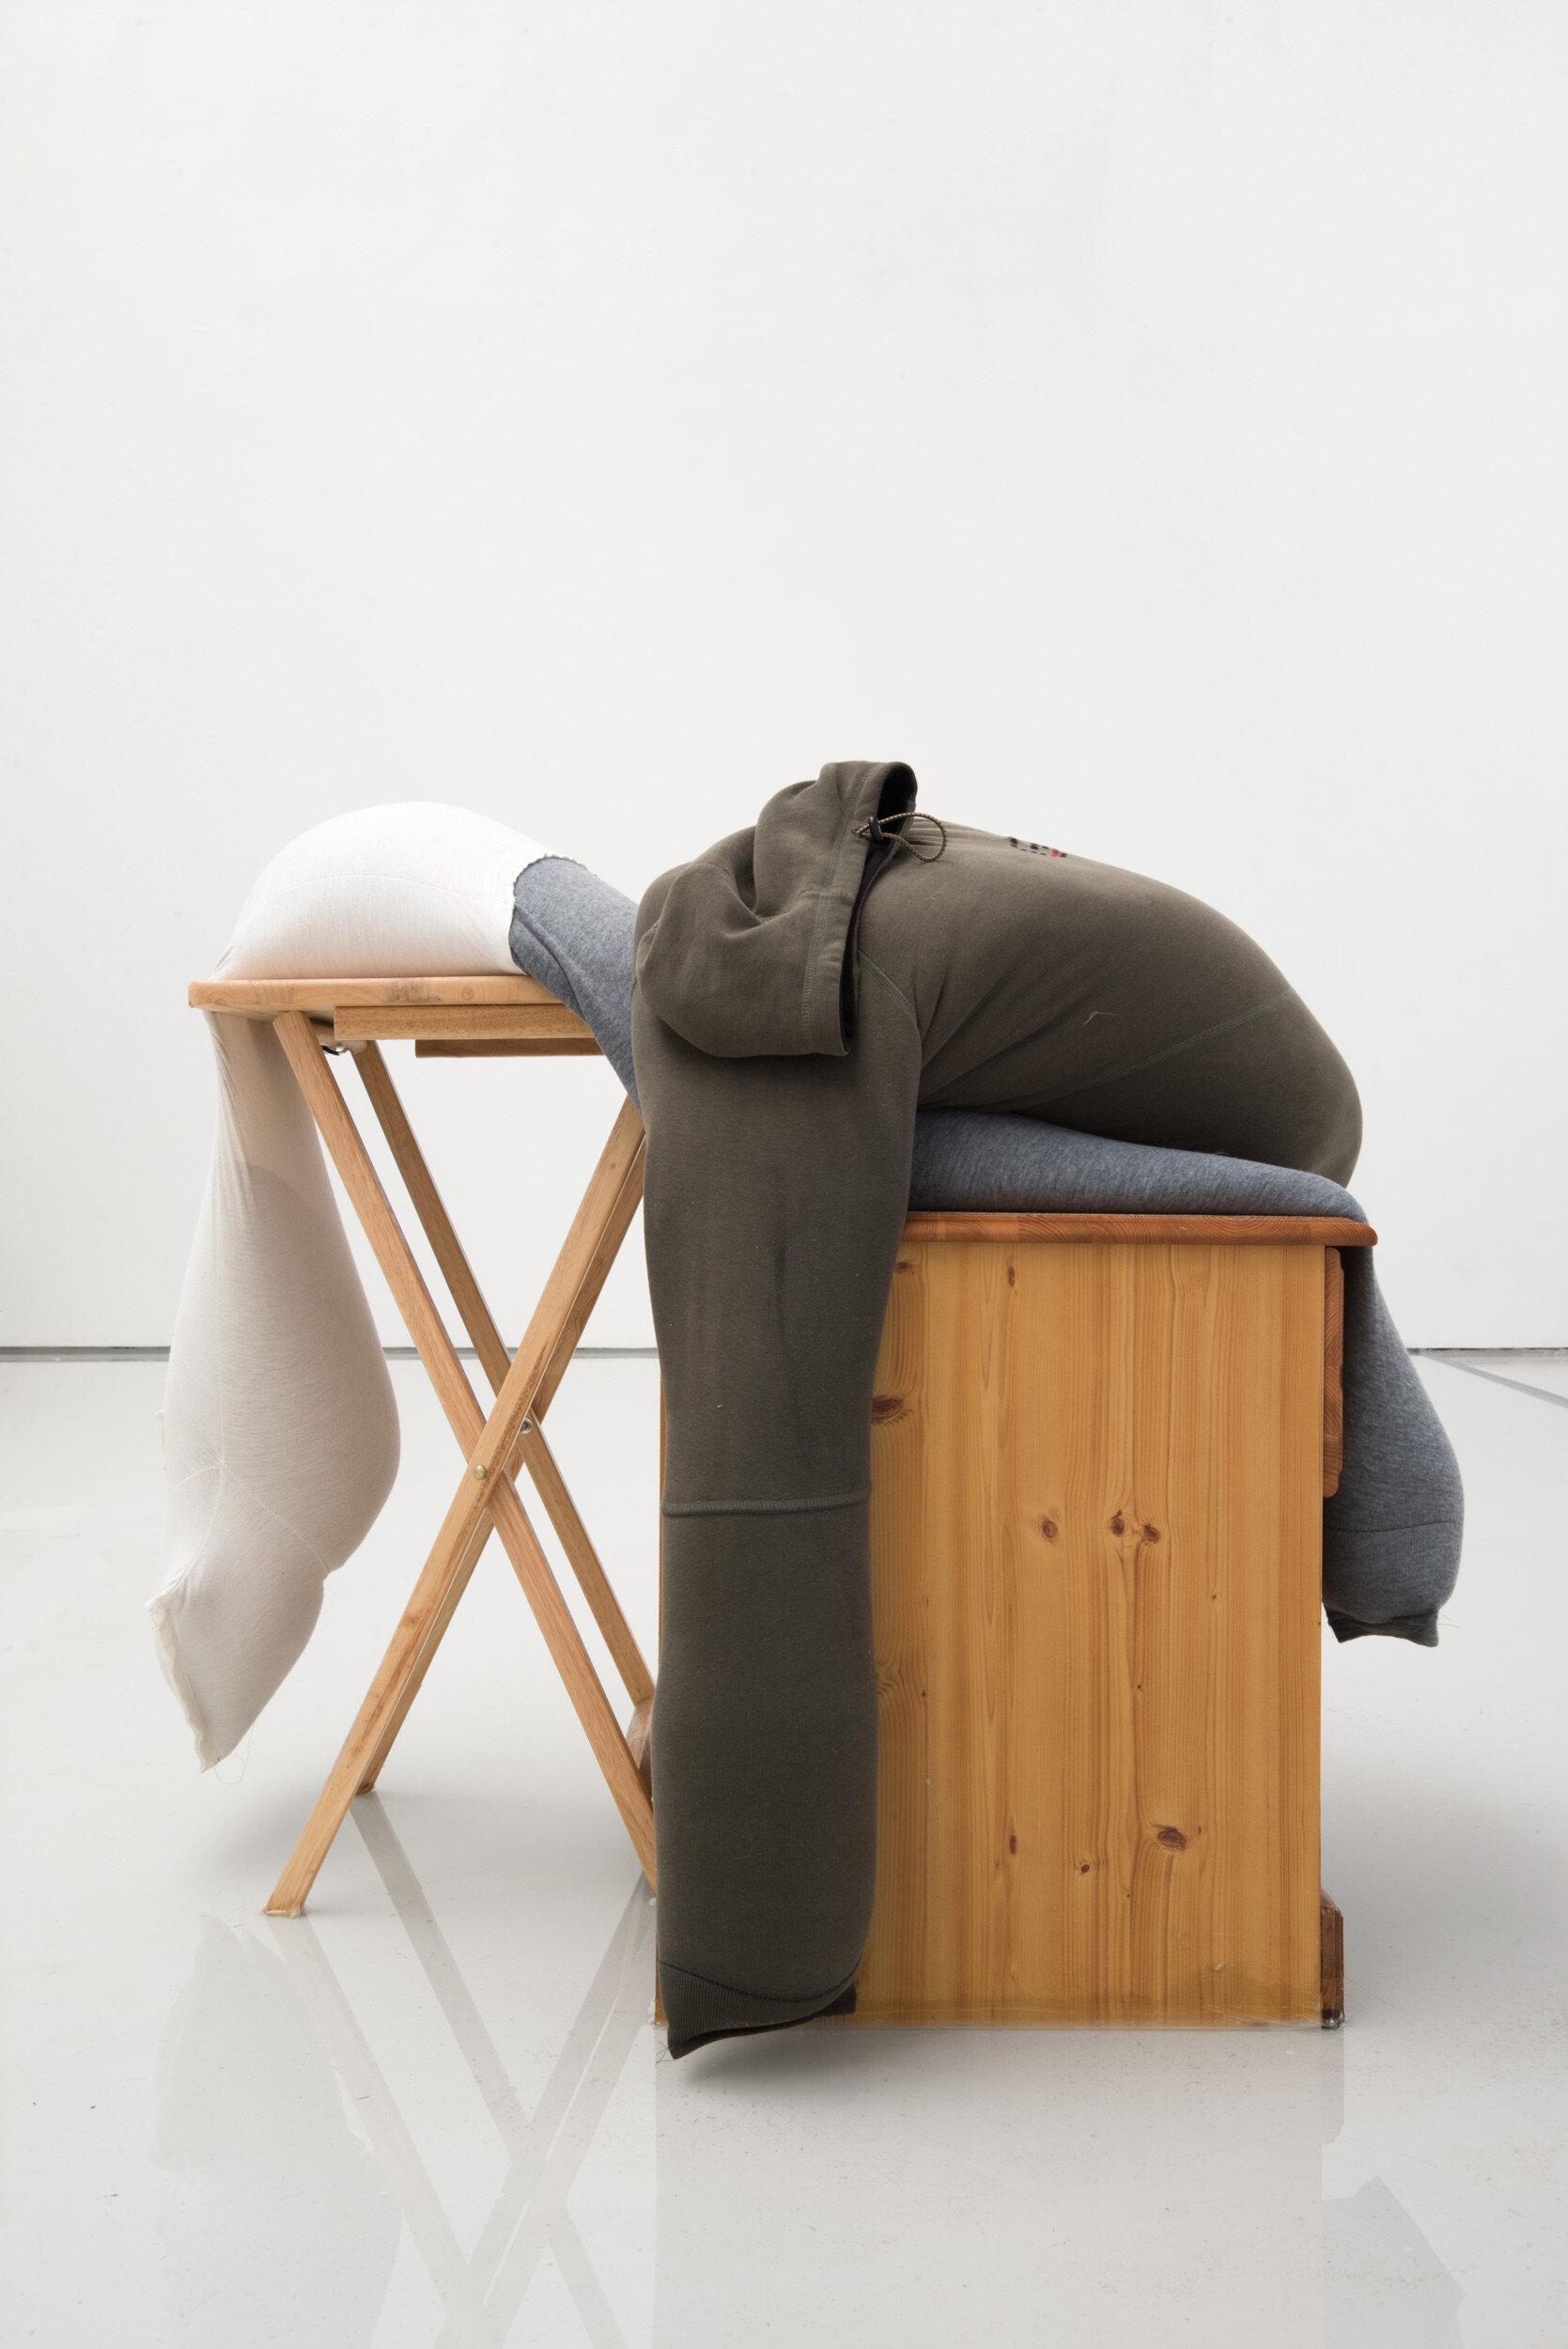 Sag on a folding table, slip on a bedside cabinet in water, Alex Farrar, Bloc Projects, 2019, 1.jpg